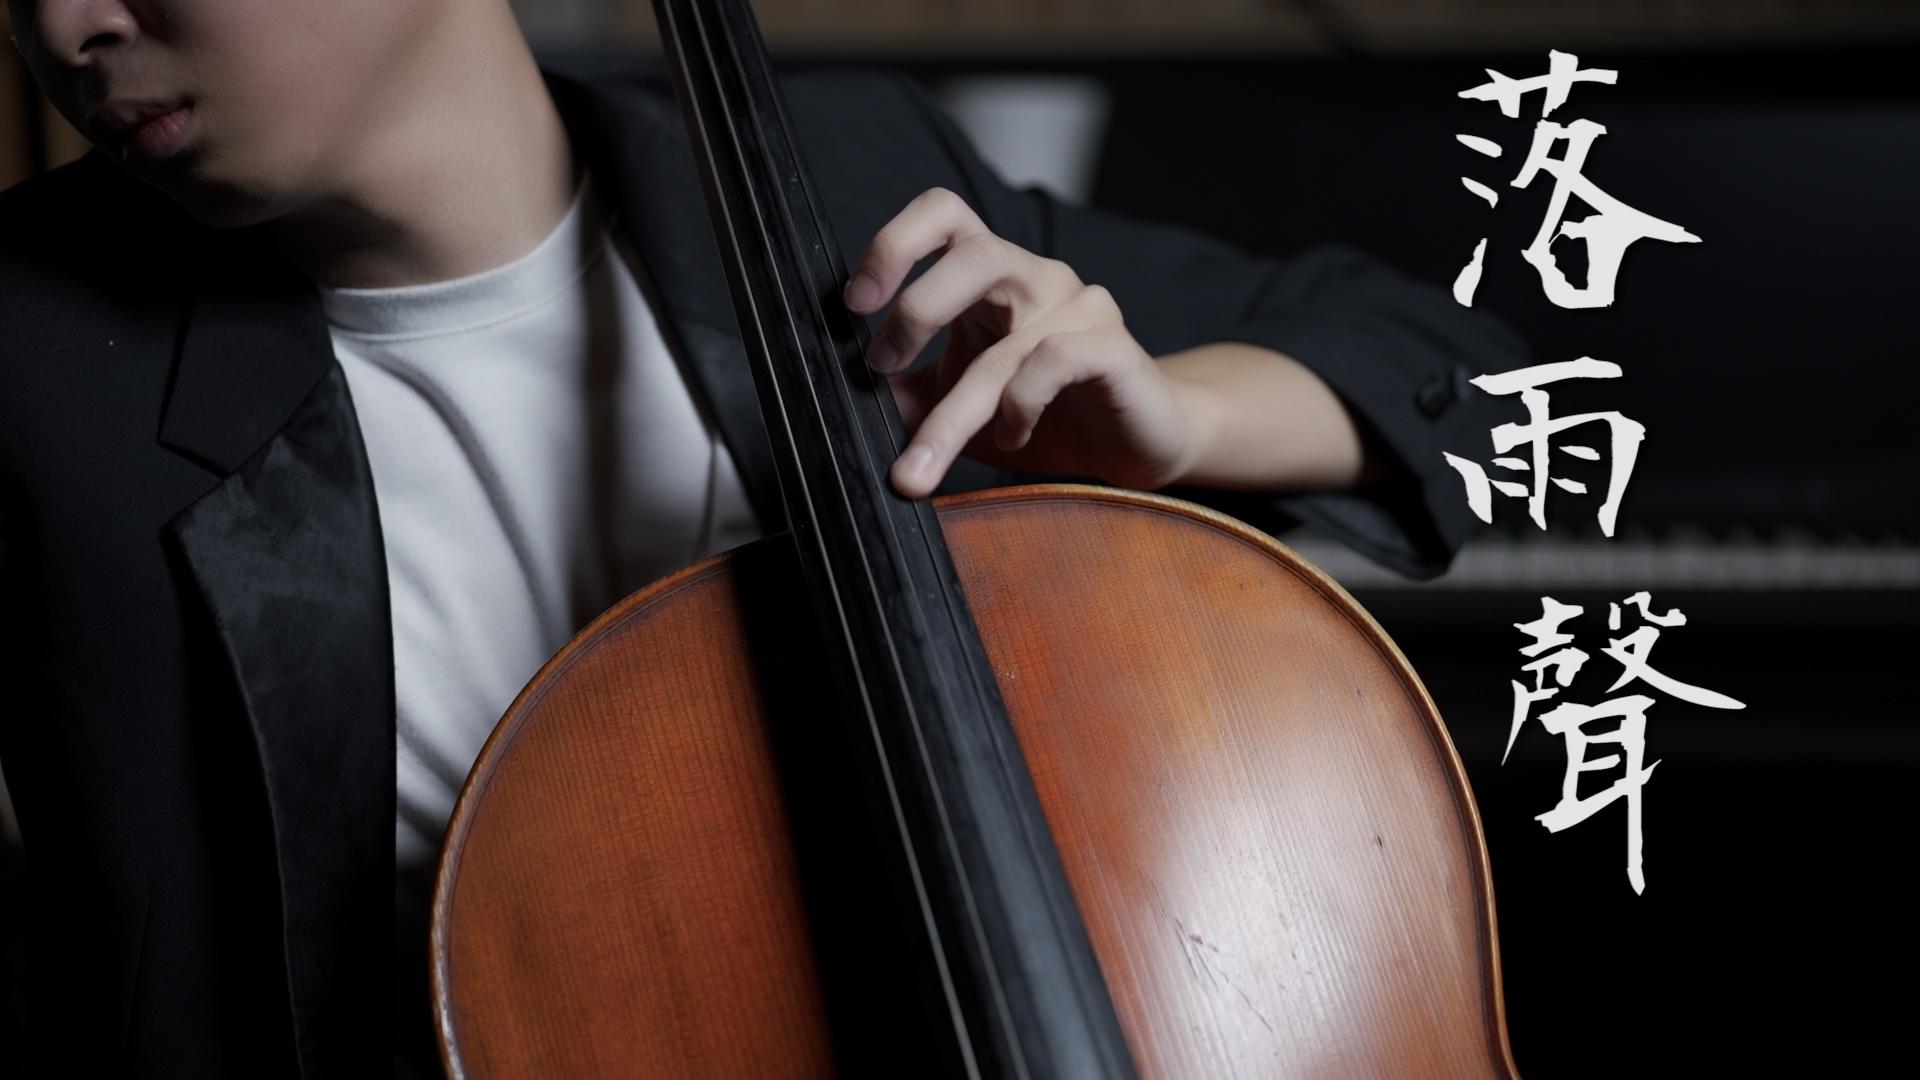 Sound of Raining《落雨聲》江蕙 cello cover 大提琴演奏 『cover by YoYo Cello』